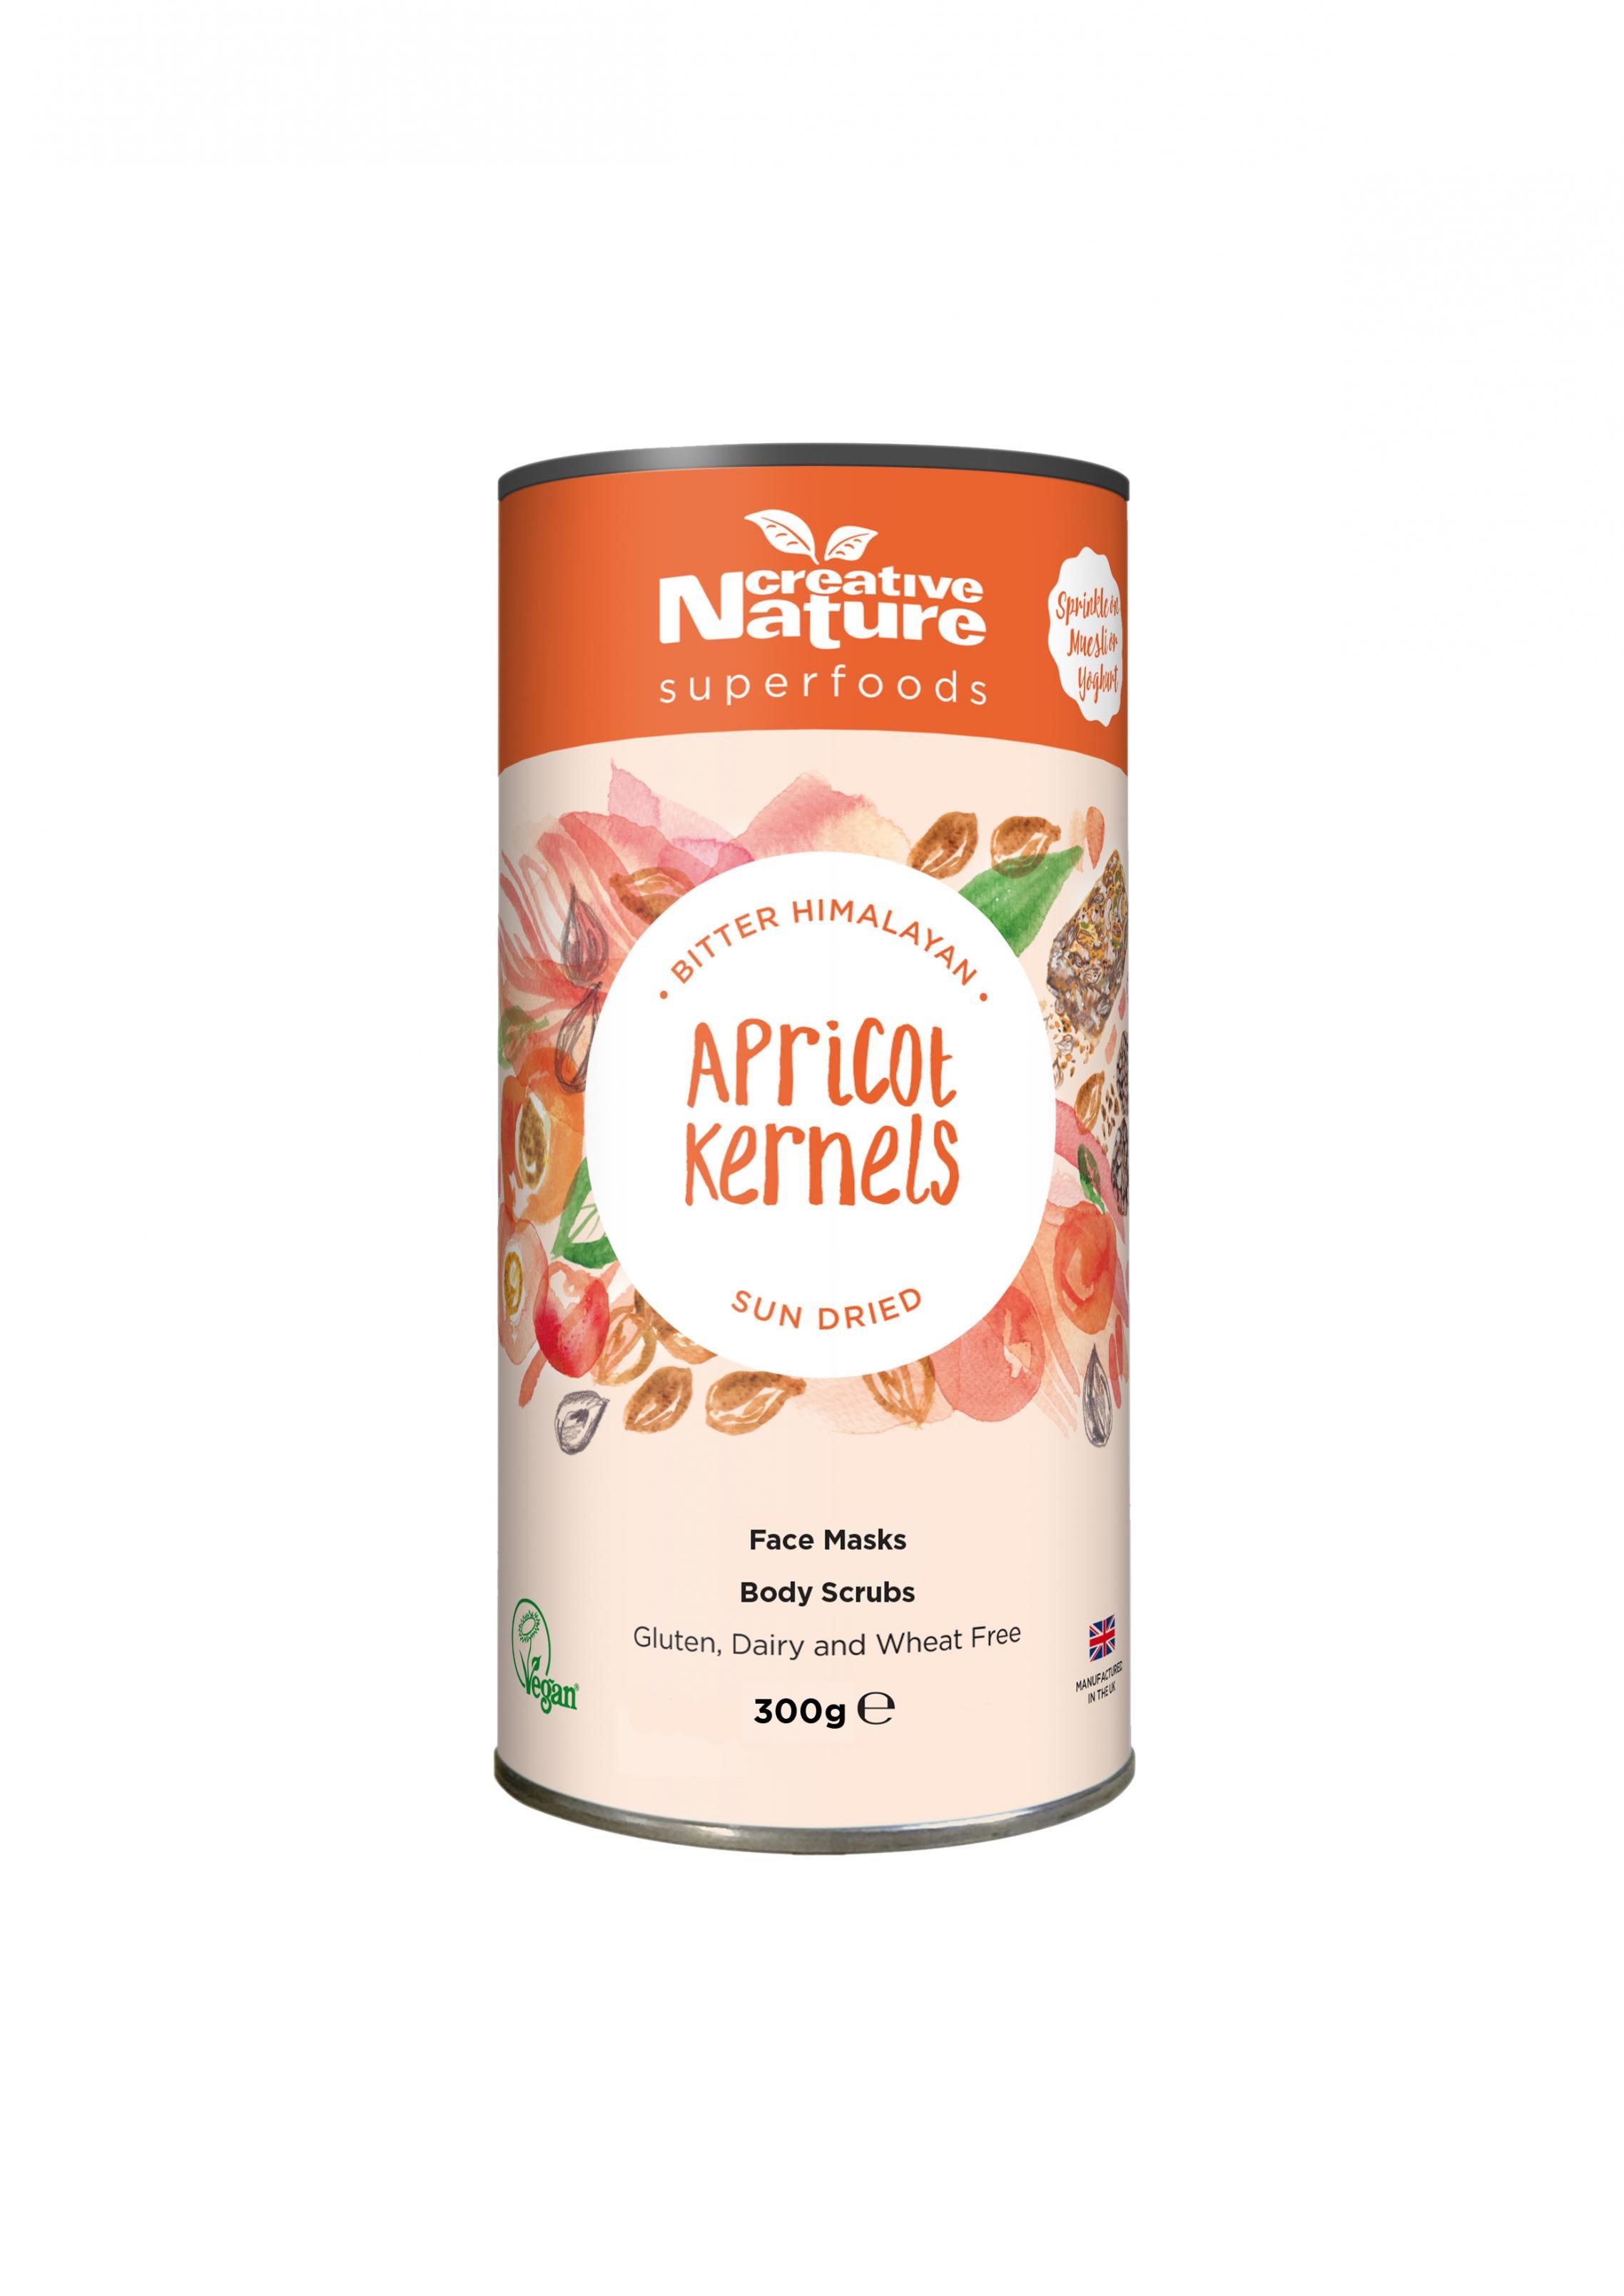 Apricot Kernels 300g